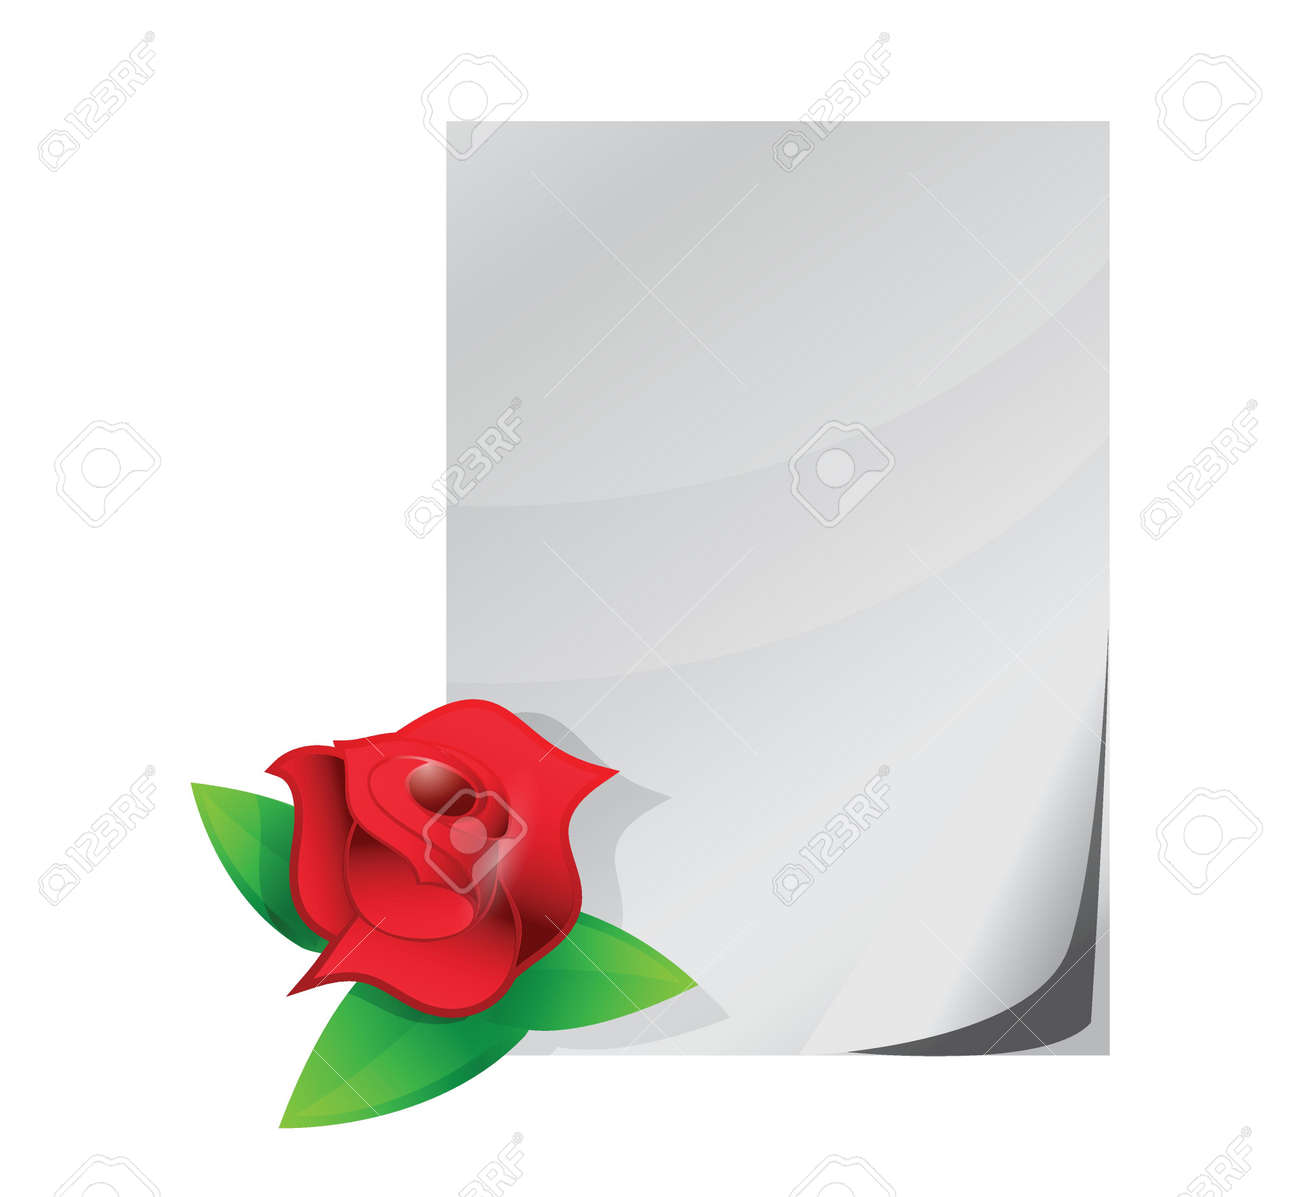 red rose love letter illustration design over a white background stock vector 20151933